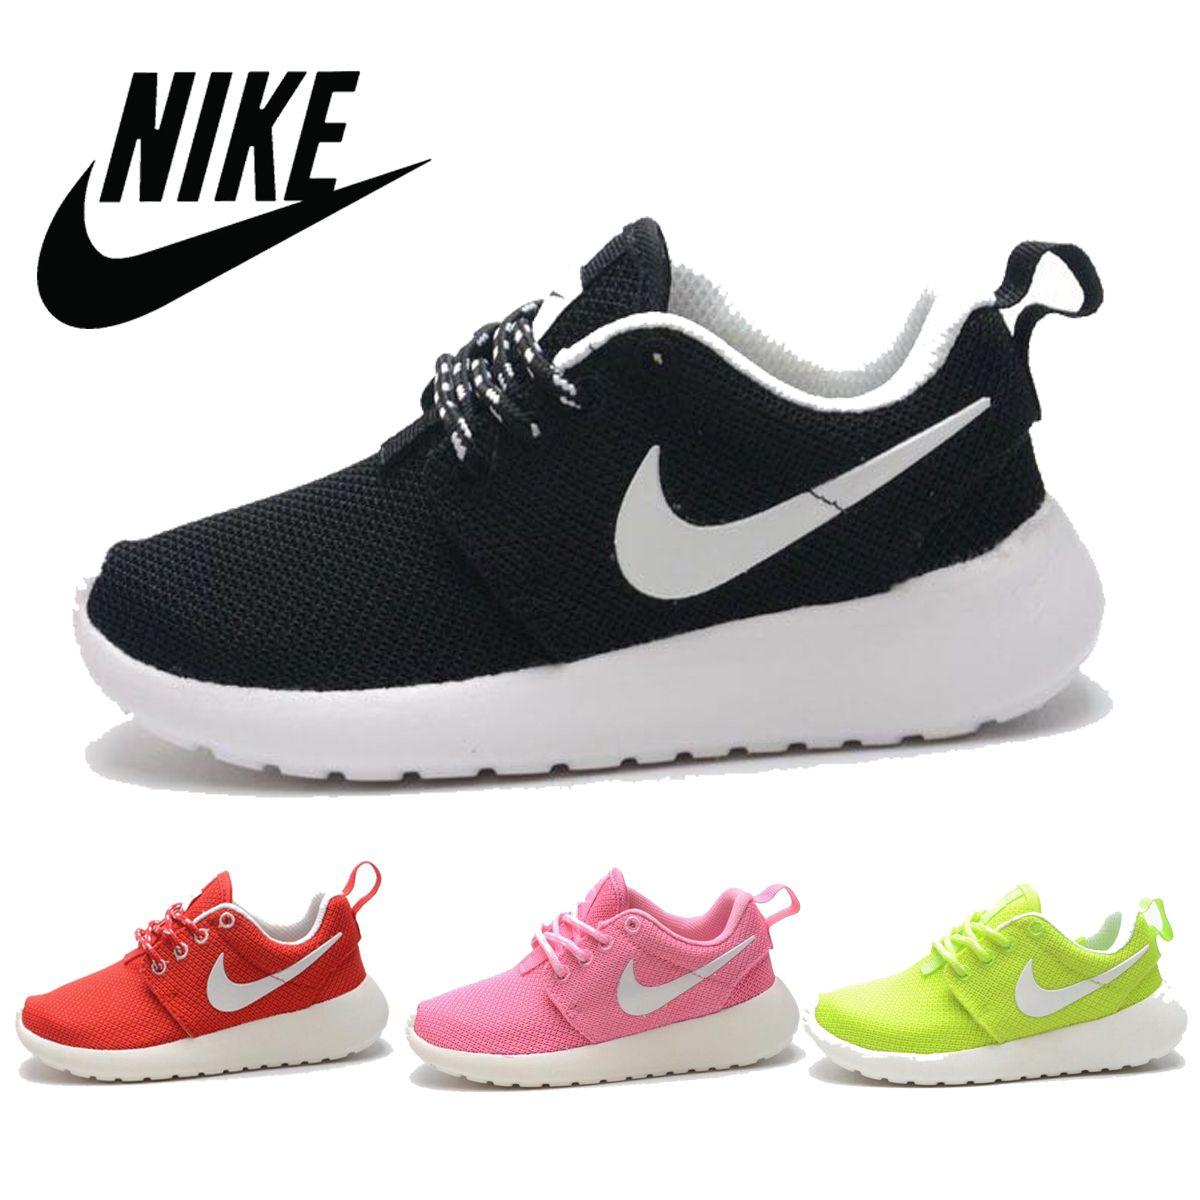 Nike Free Run Children S Shoes